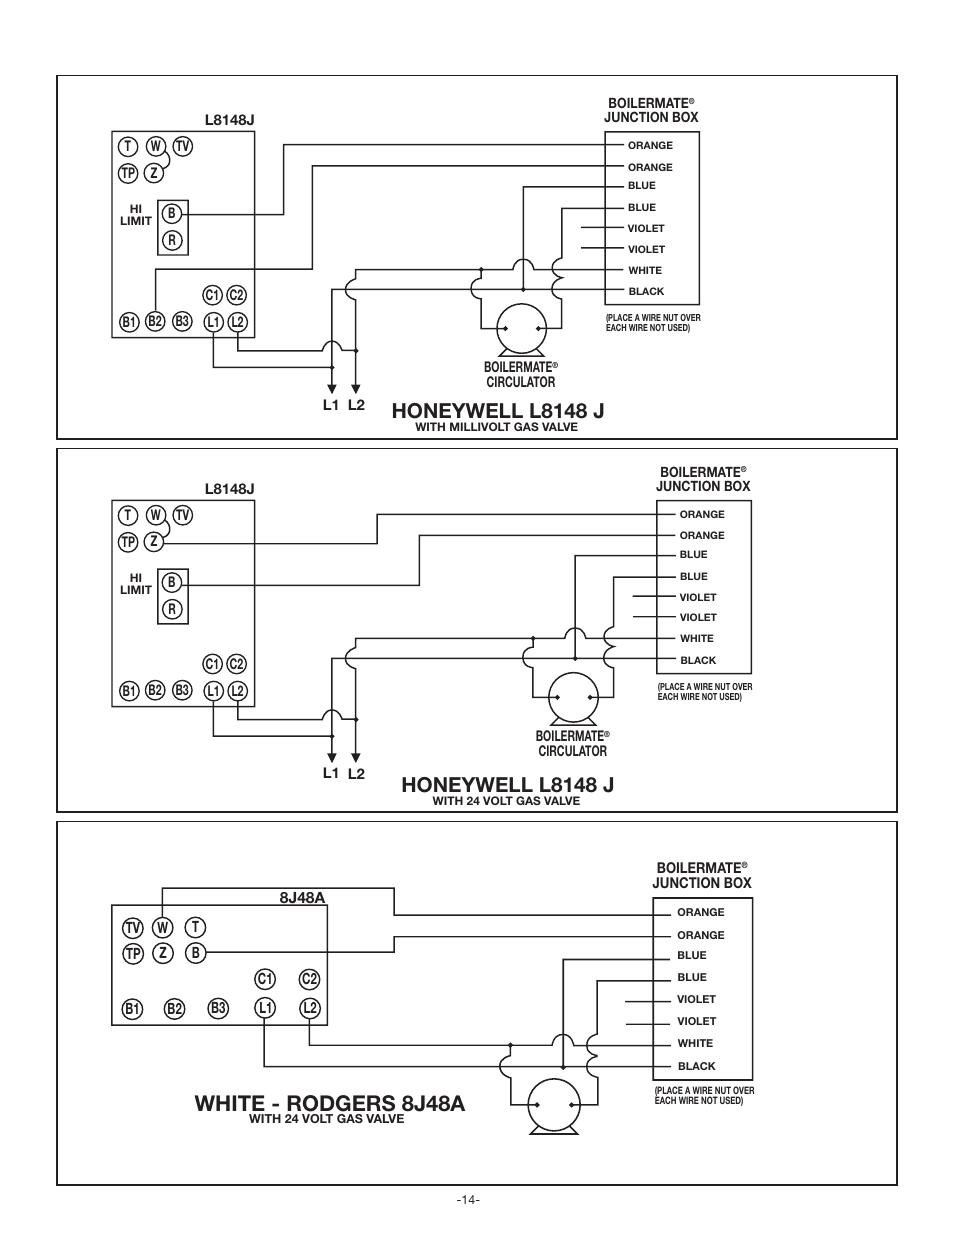 Amtrol Wiring Diagram | #1 Wiring Diagram Source